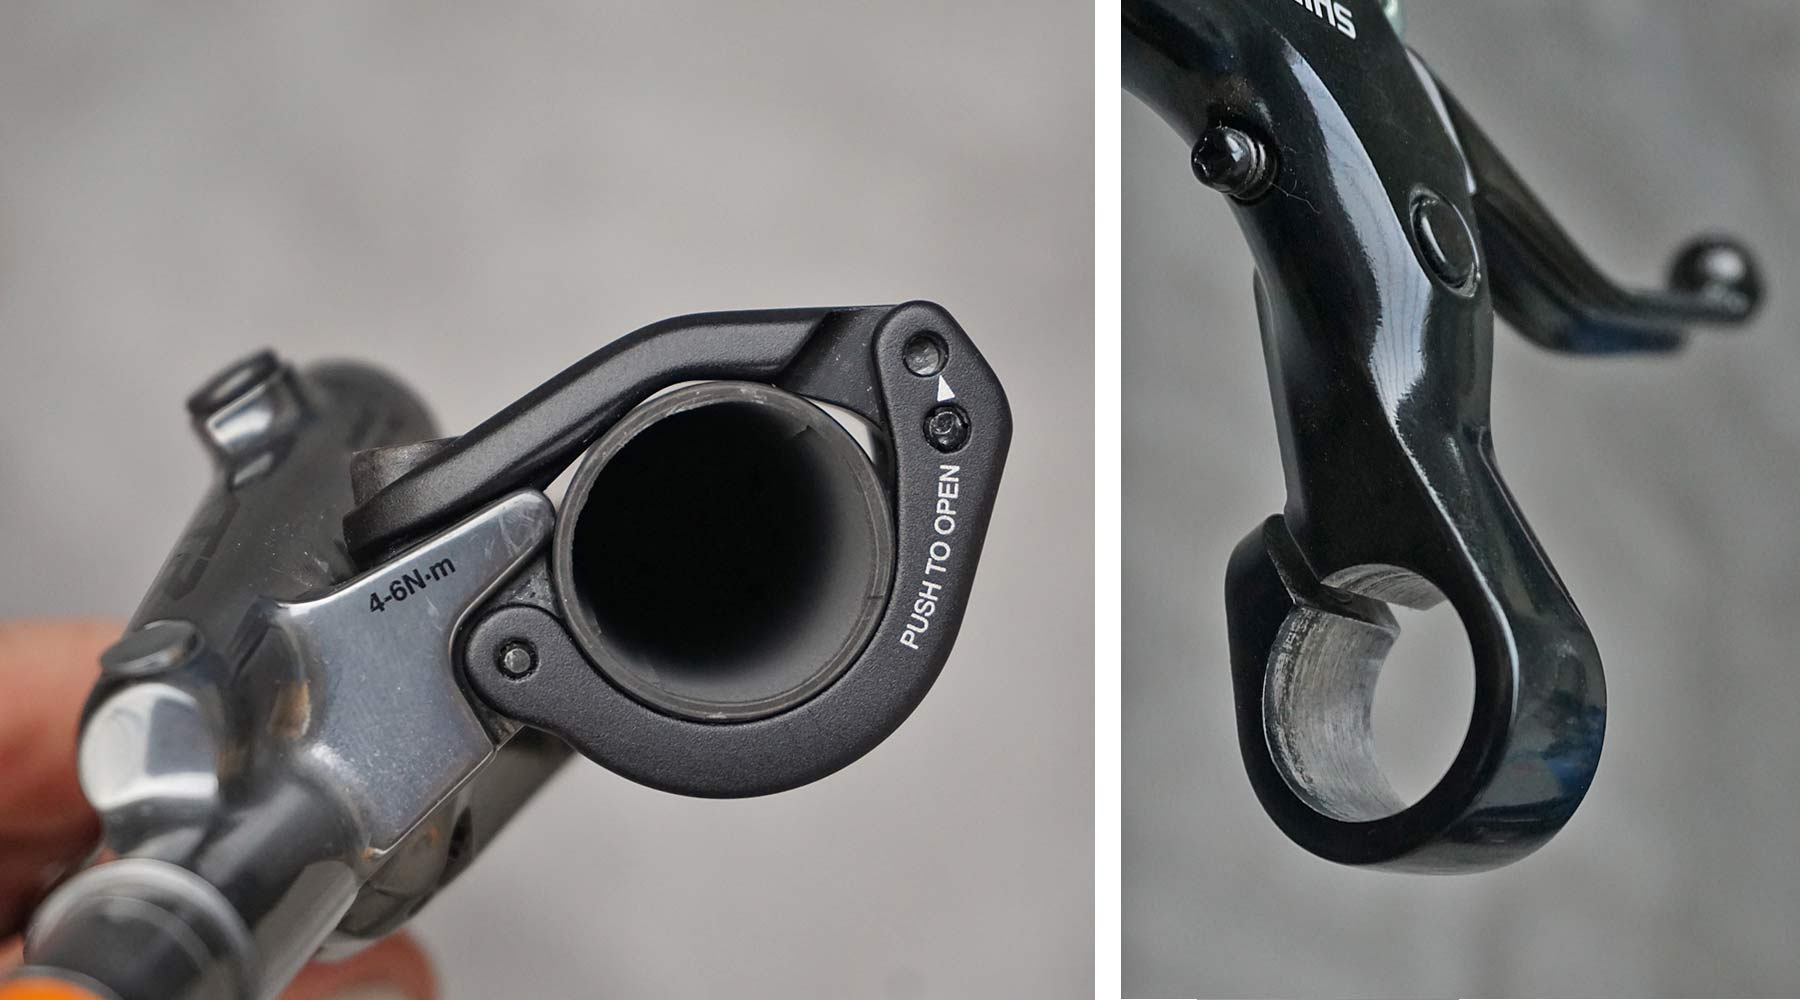 Beast MTB Flatbar 2.0 Riser Bars 2.0, lightweight reinforced carbon mountain bike handlebars,clamp types